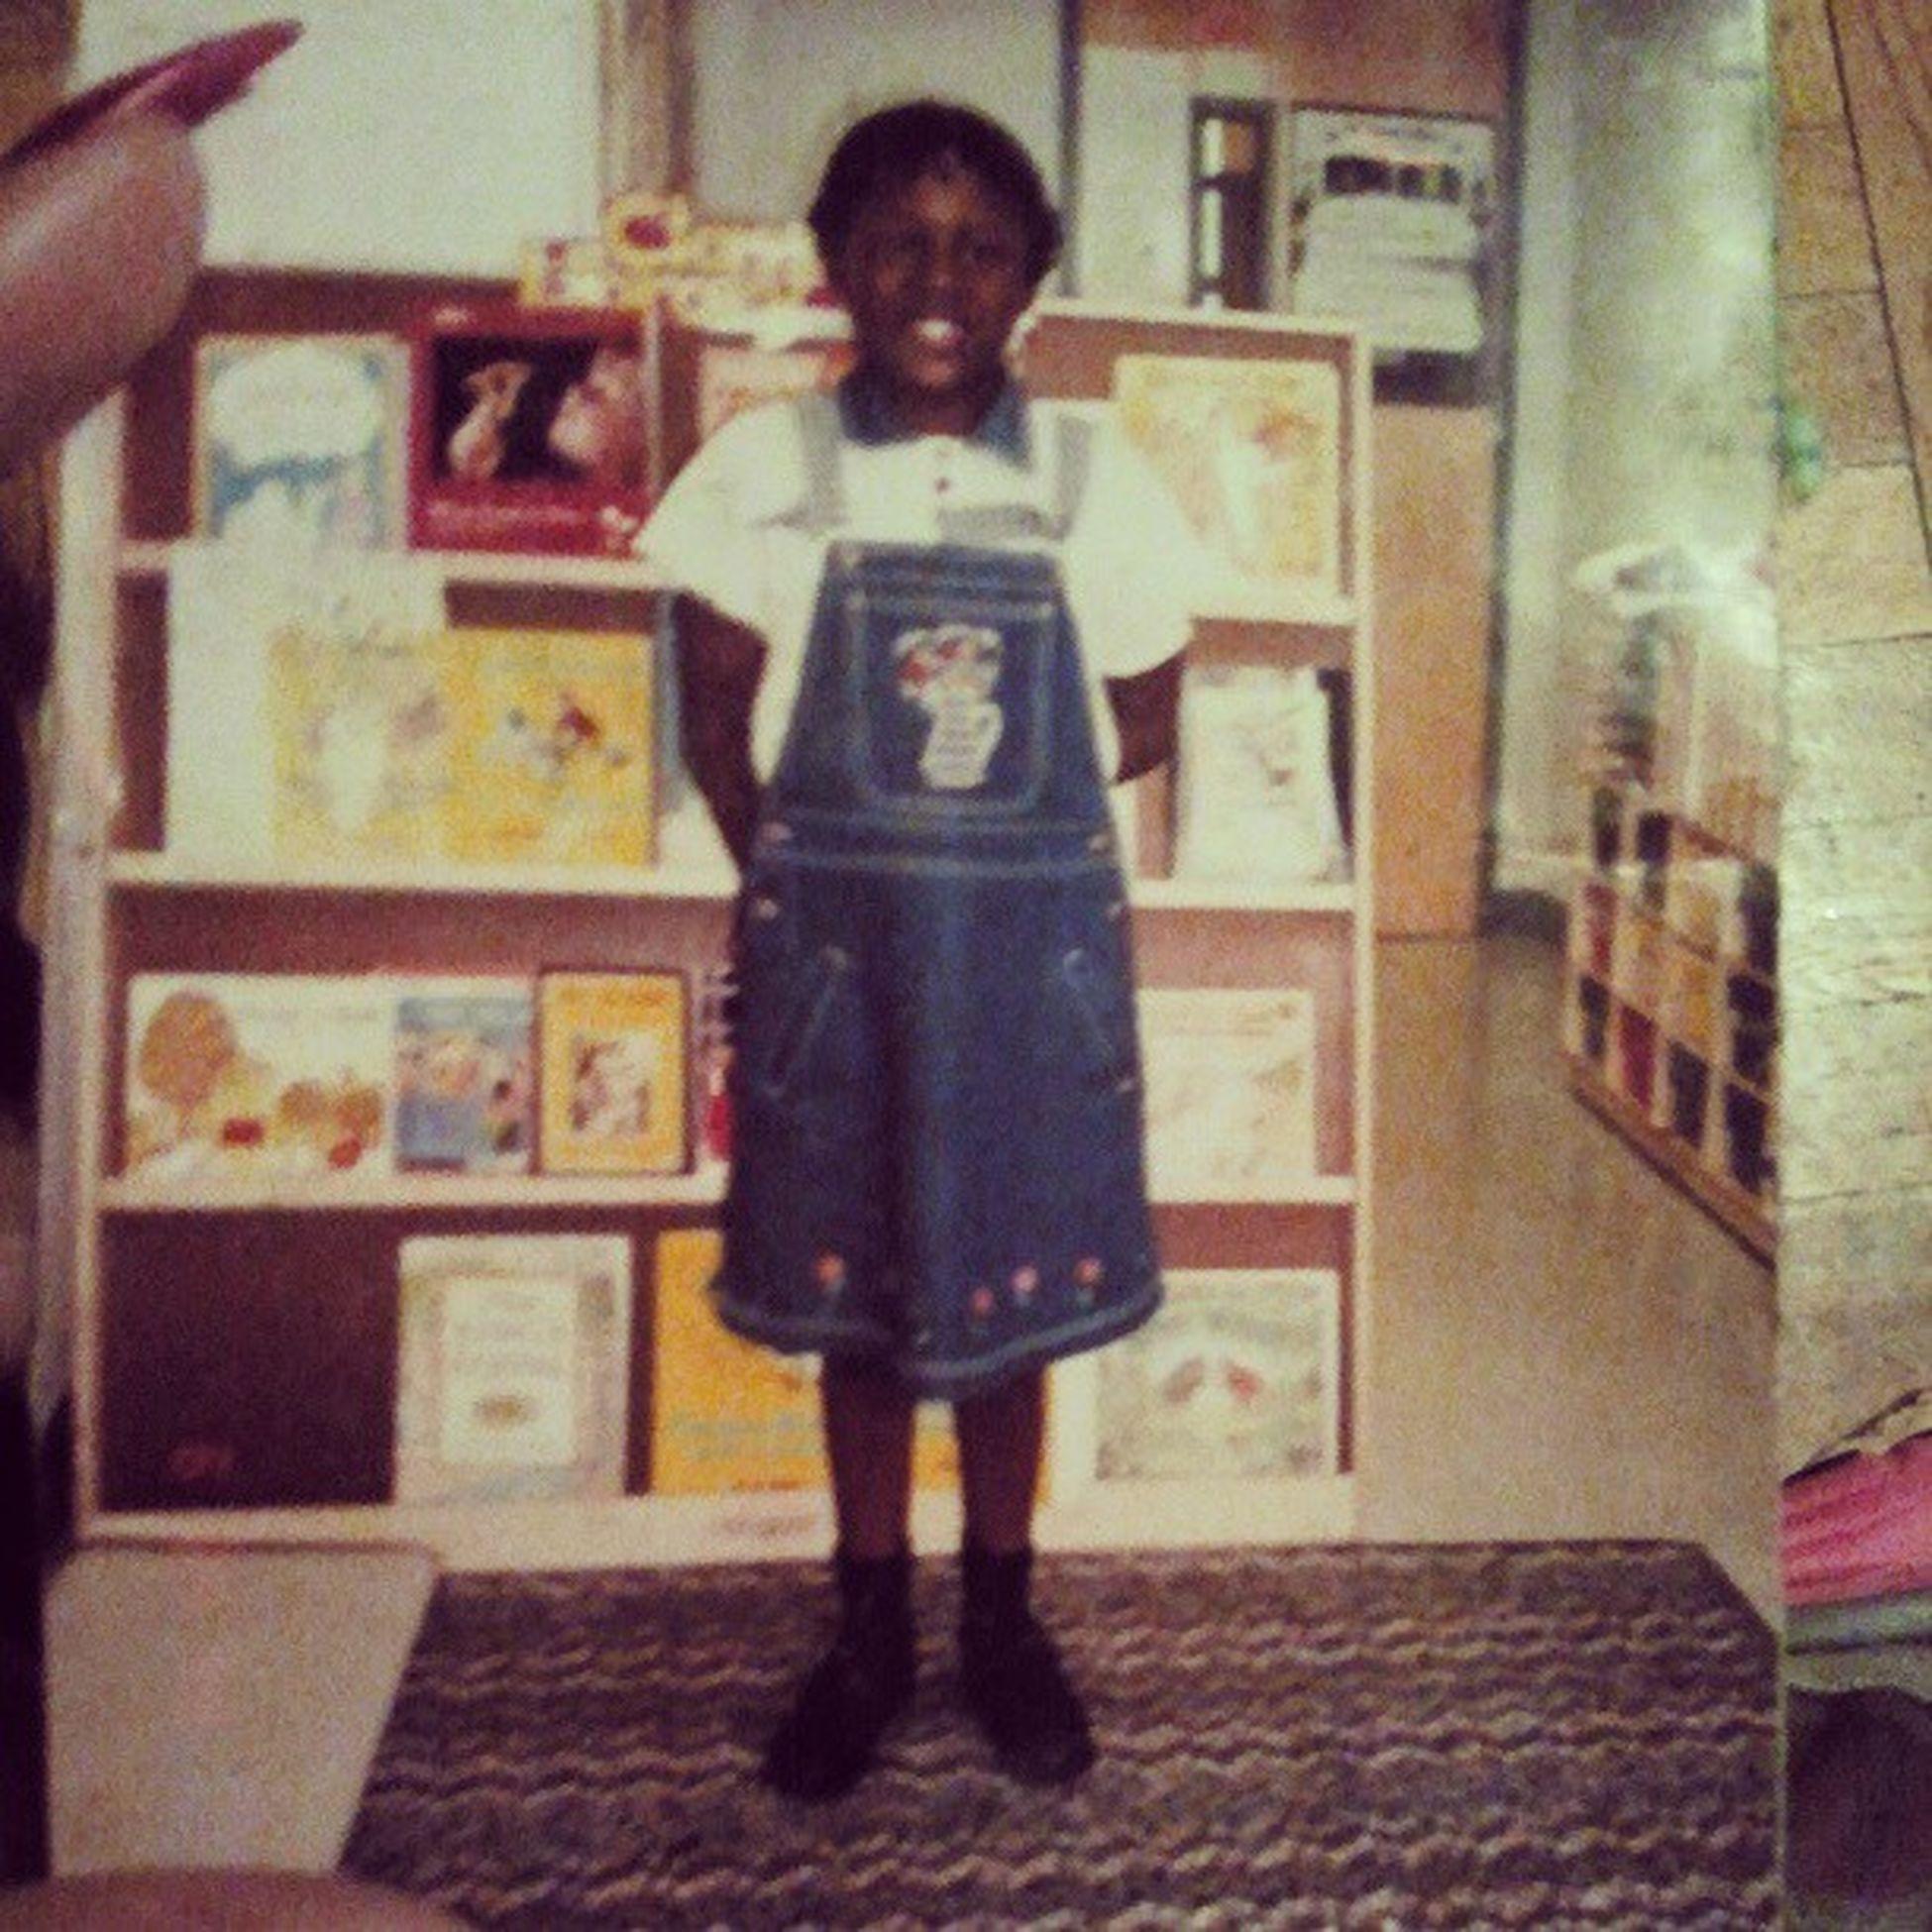 My awkward years (first grade) age 6 Buckteeth Lazyeye Bigfeet Nohair uglyDress misbehaved Kid